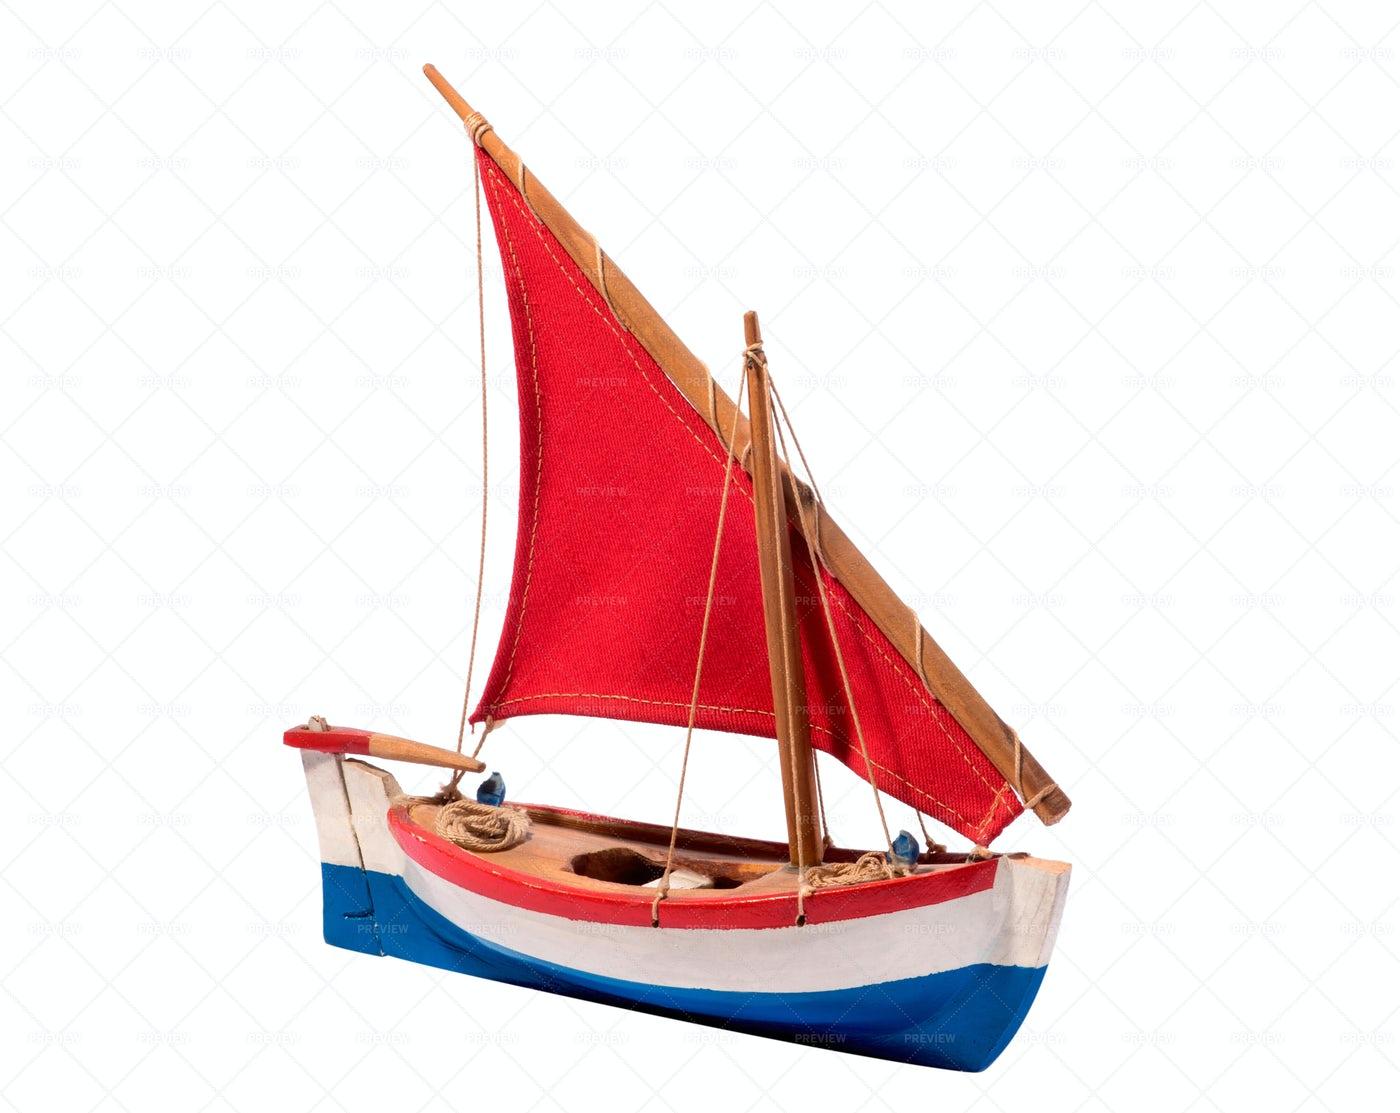 Sailing Boat Toy: Stock Photos